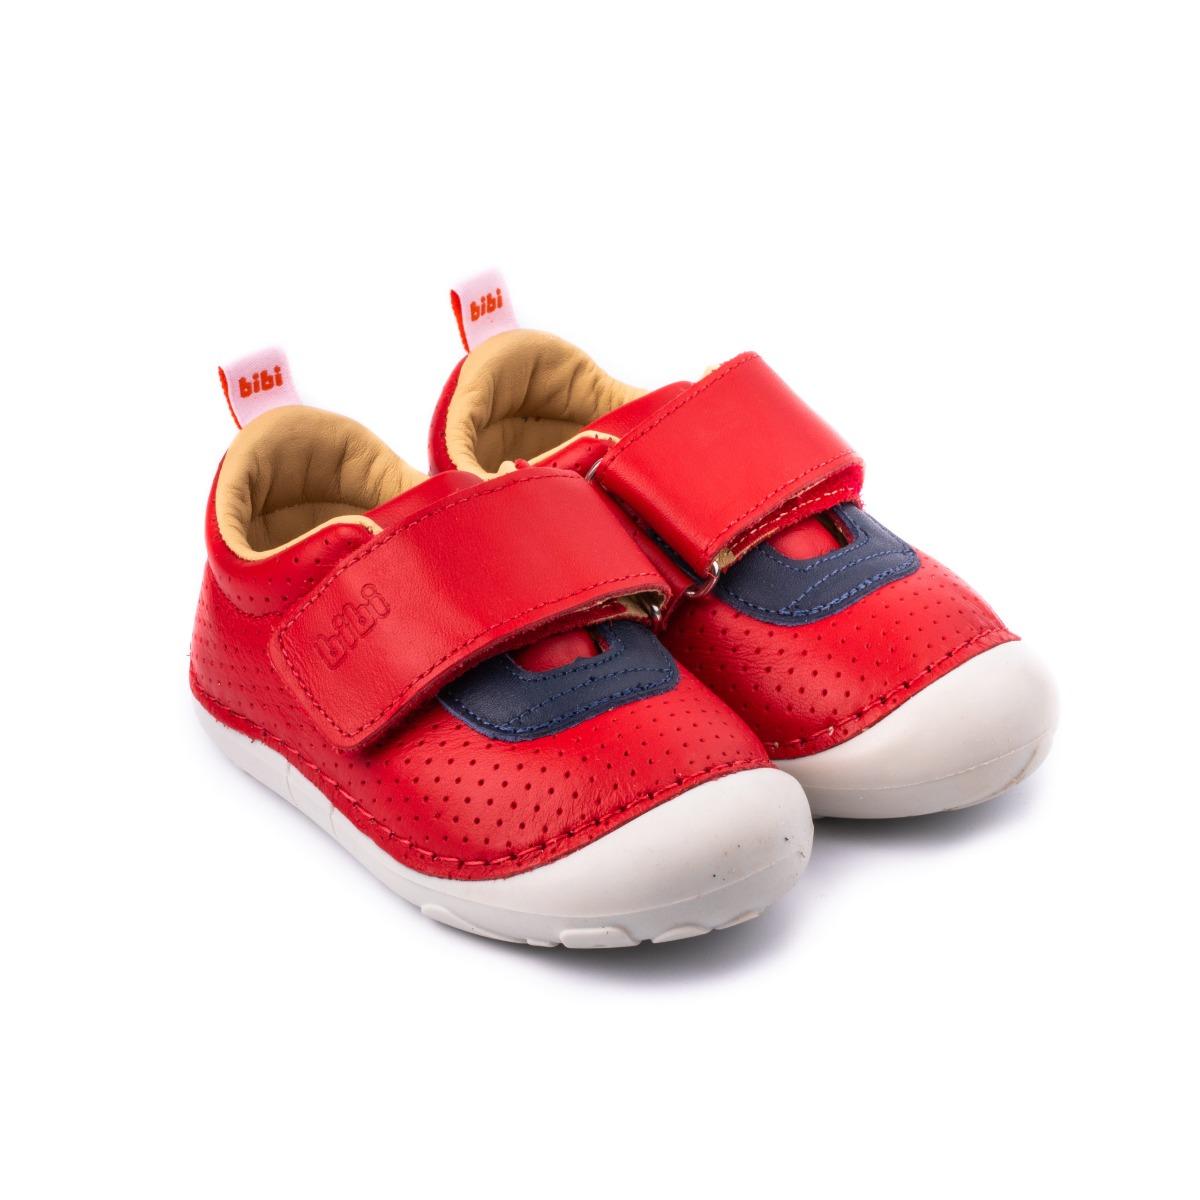 Pantofi sport unisex Bibi Shoes Grow, Rosu